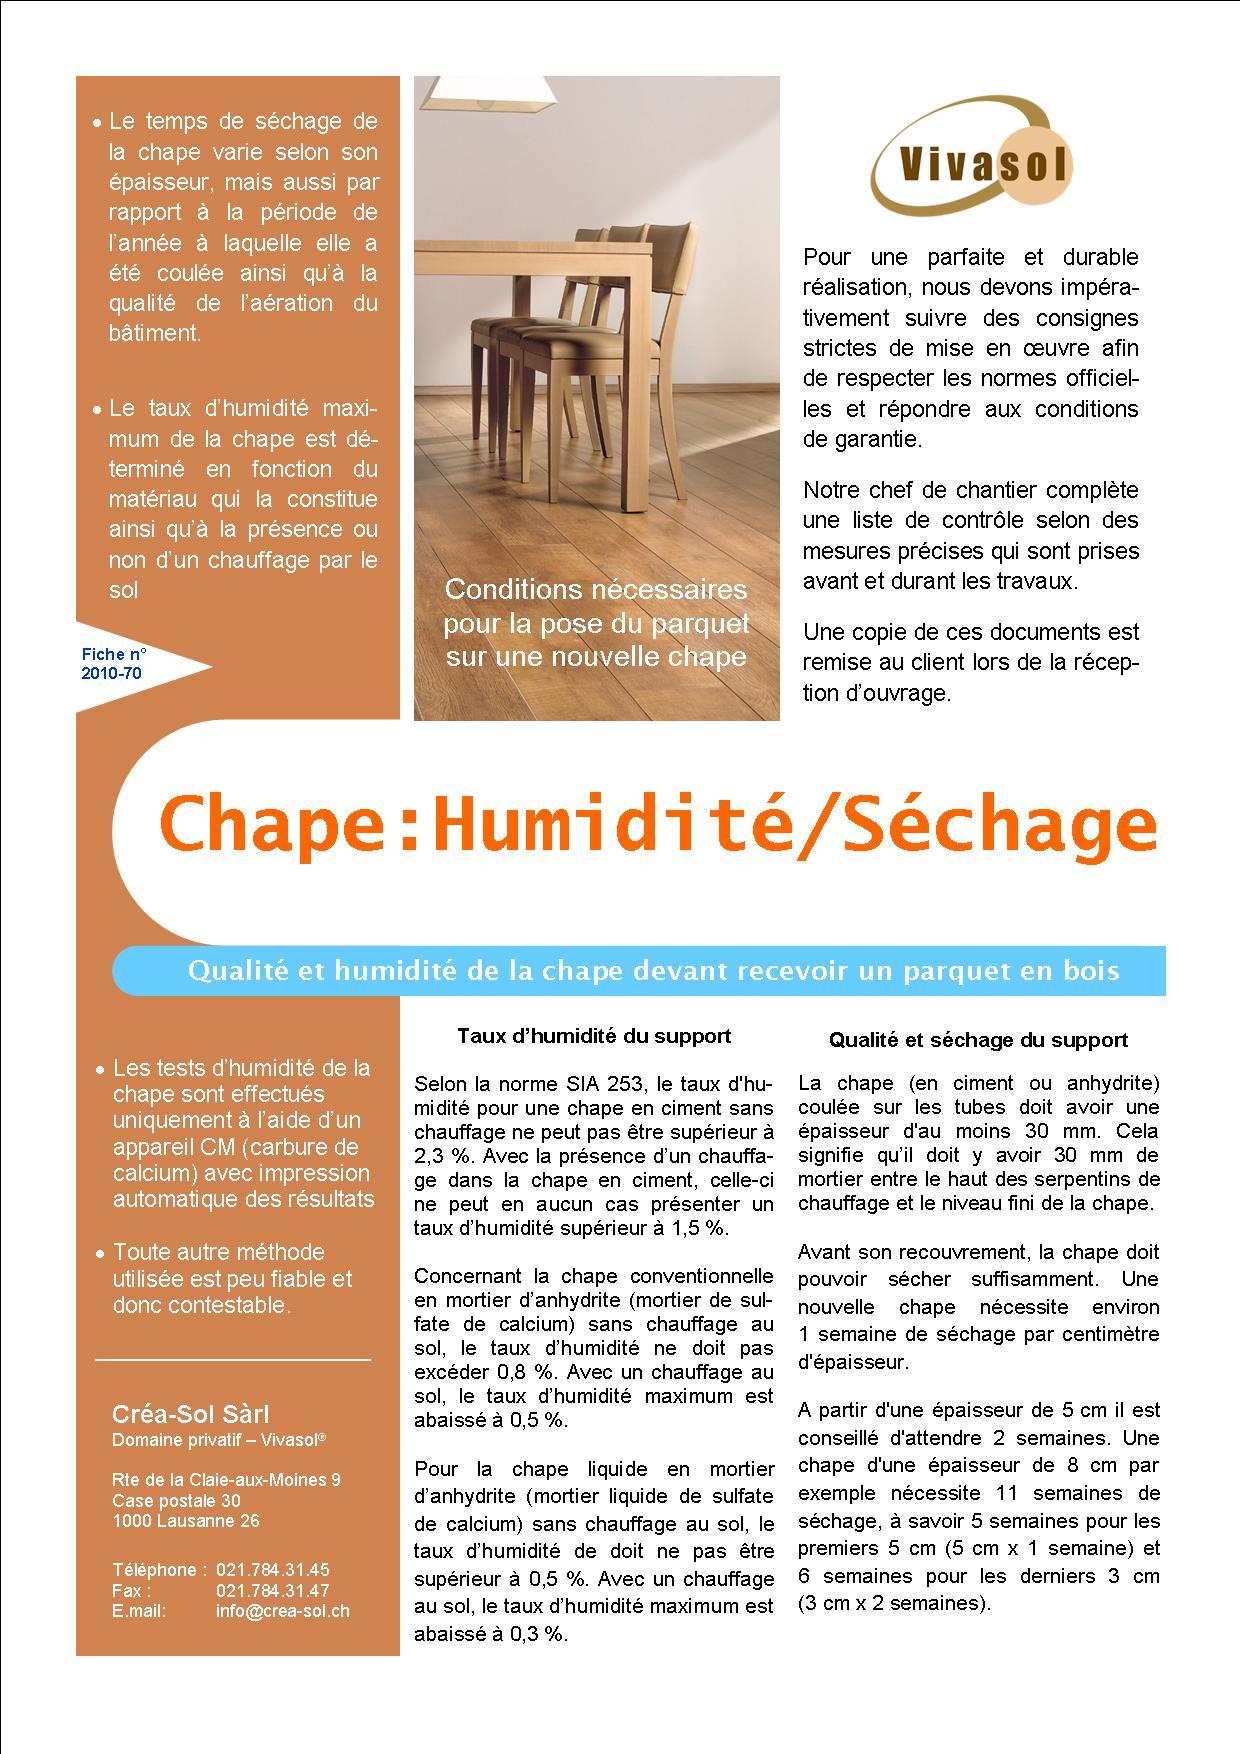 cr a sol s rl chape humidit s chage. Black Bedroom Furniture Sets. Home Design Ideas